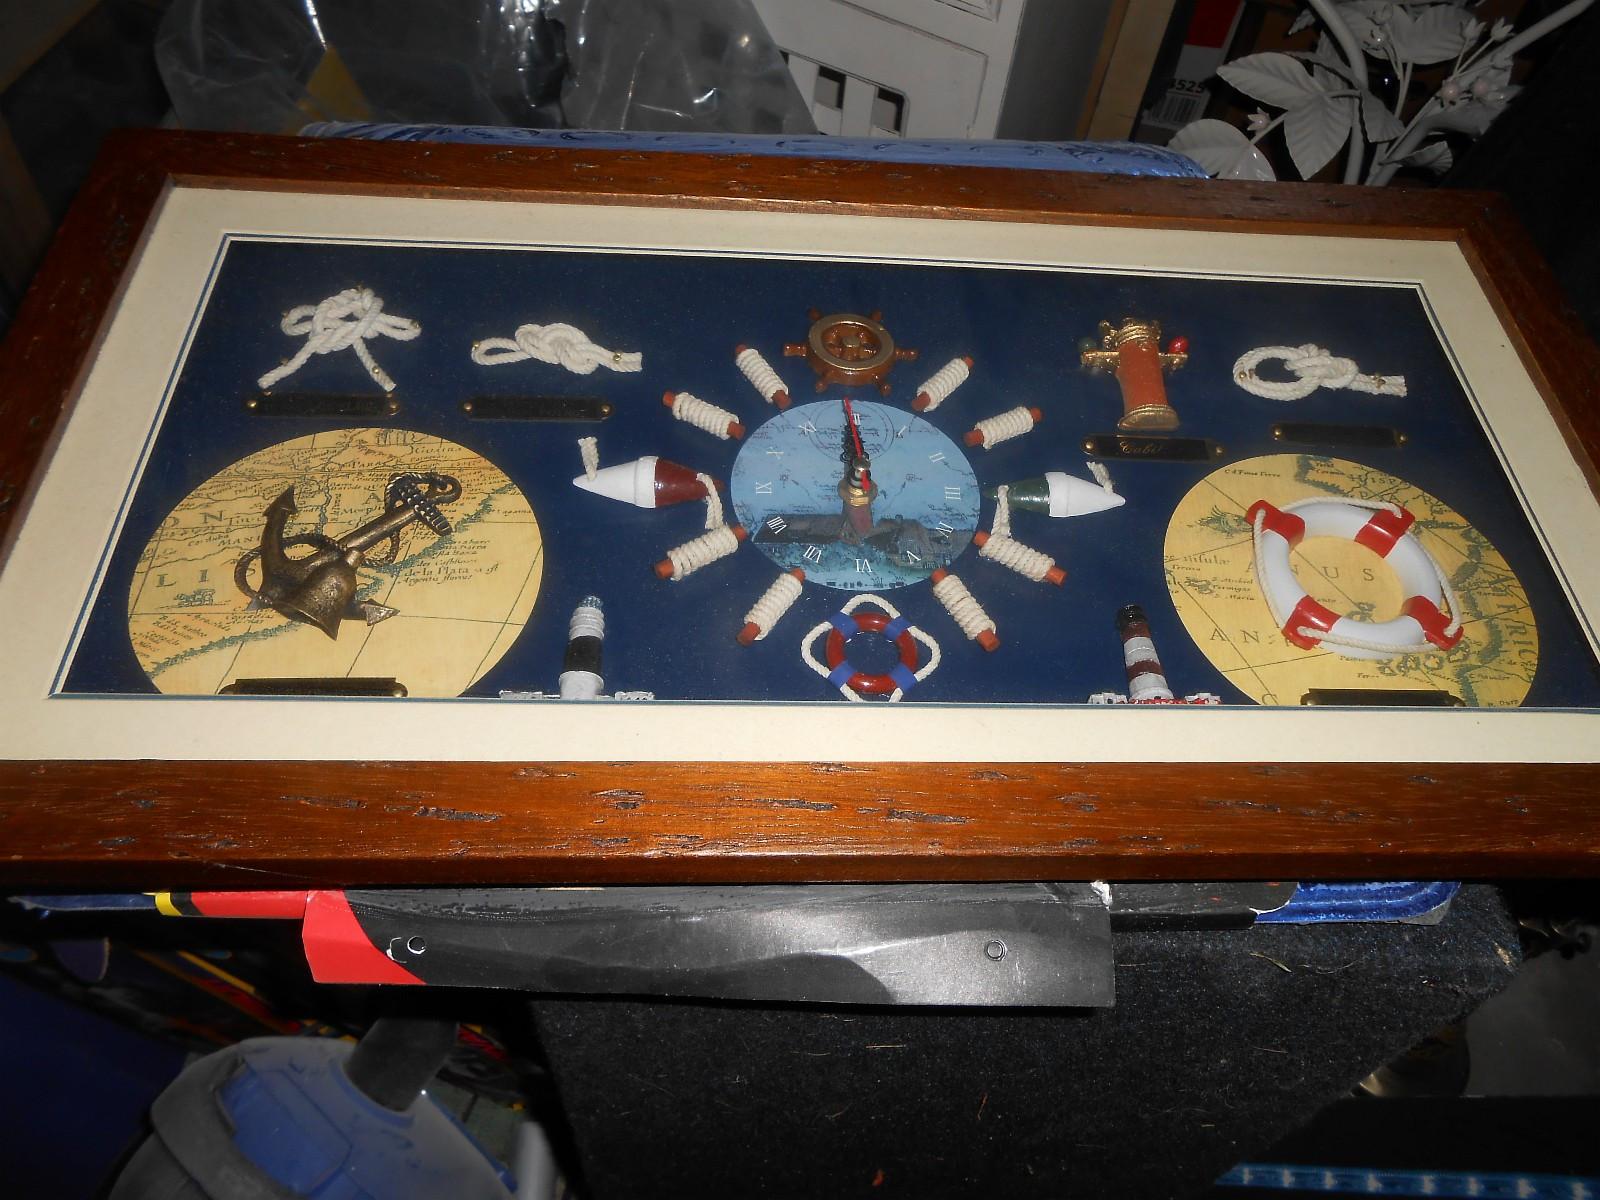 Nytt bilde med klokke - Skotterud  - 56 x 30 cm - Skotterud